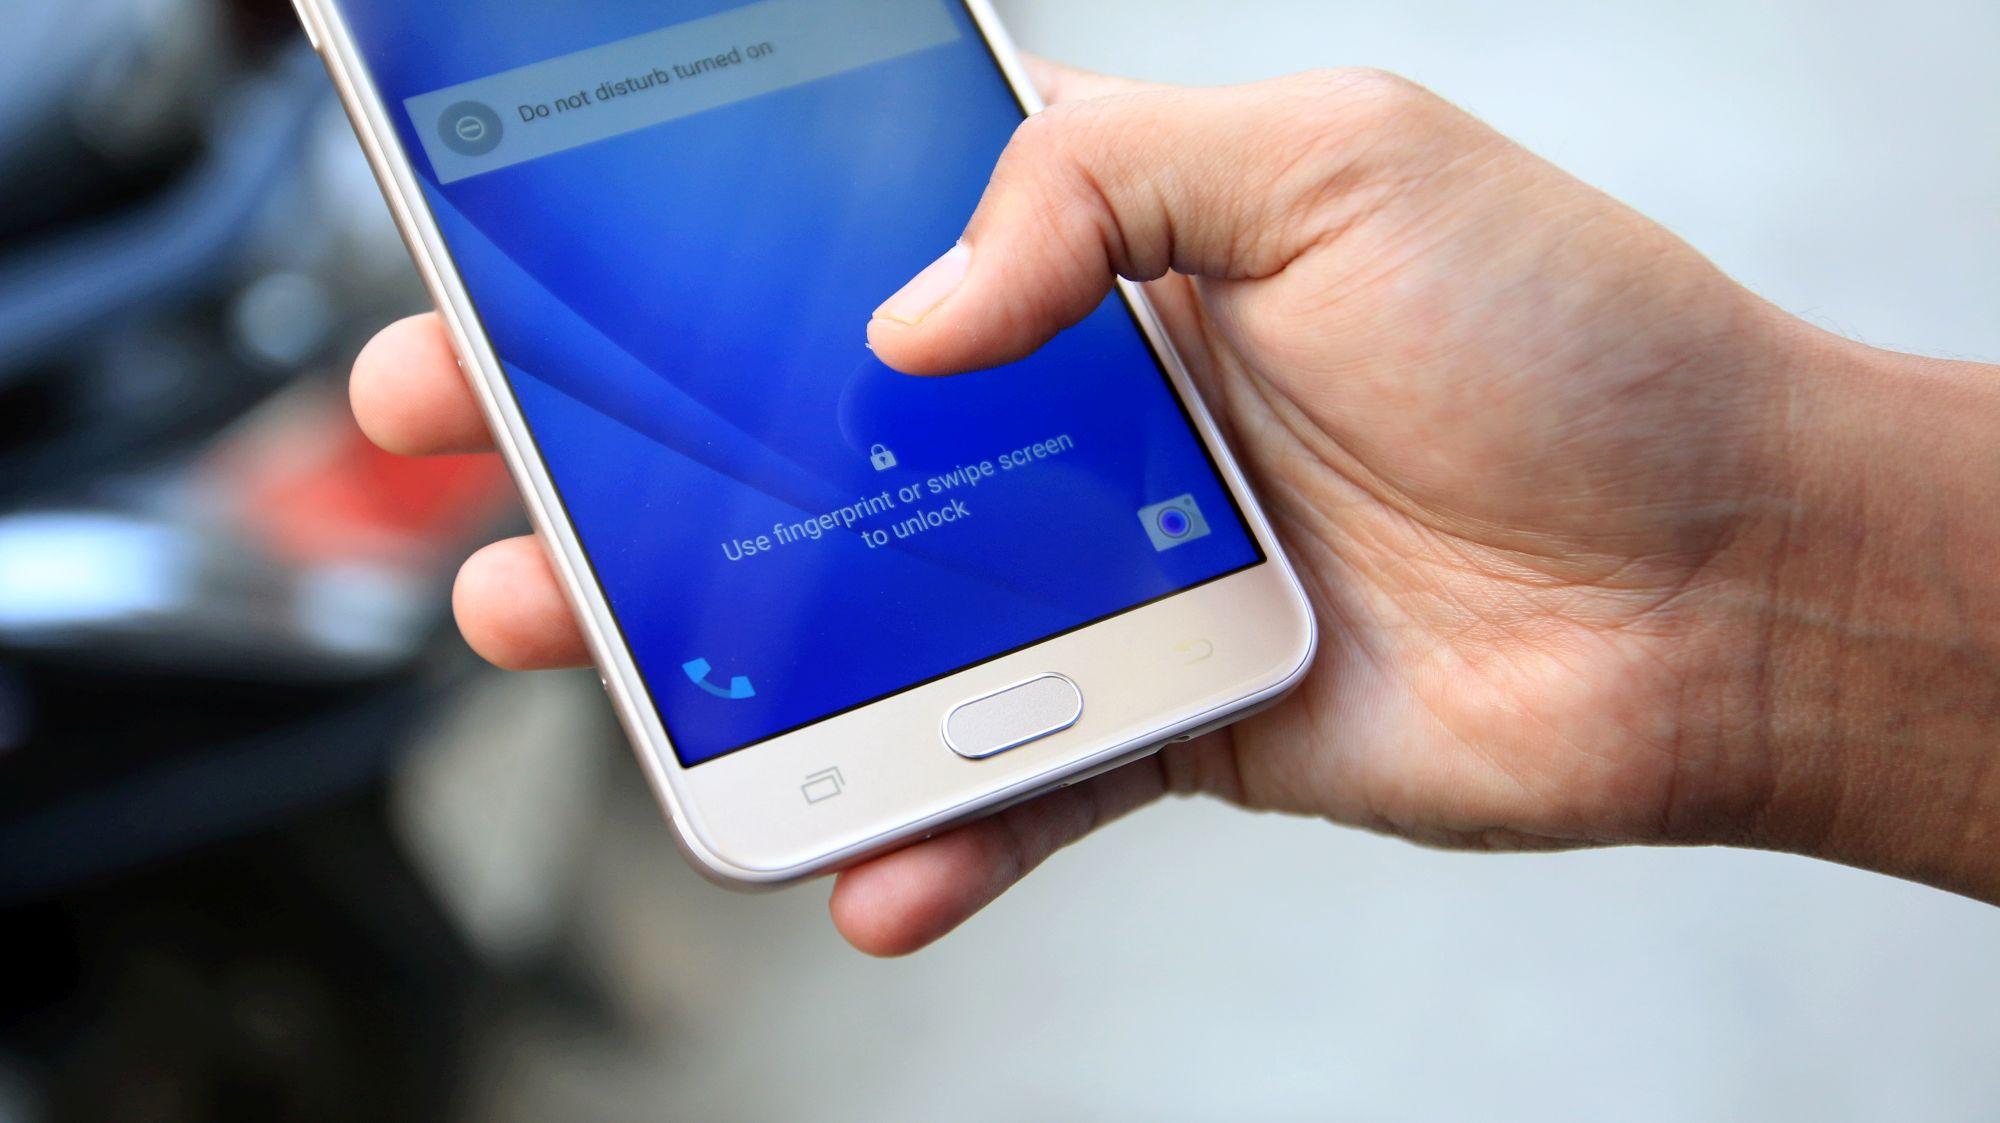 Galaxy J7 Prime fingerprint sensor doesn't need to be